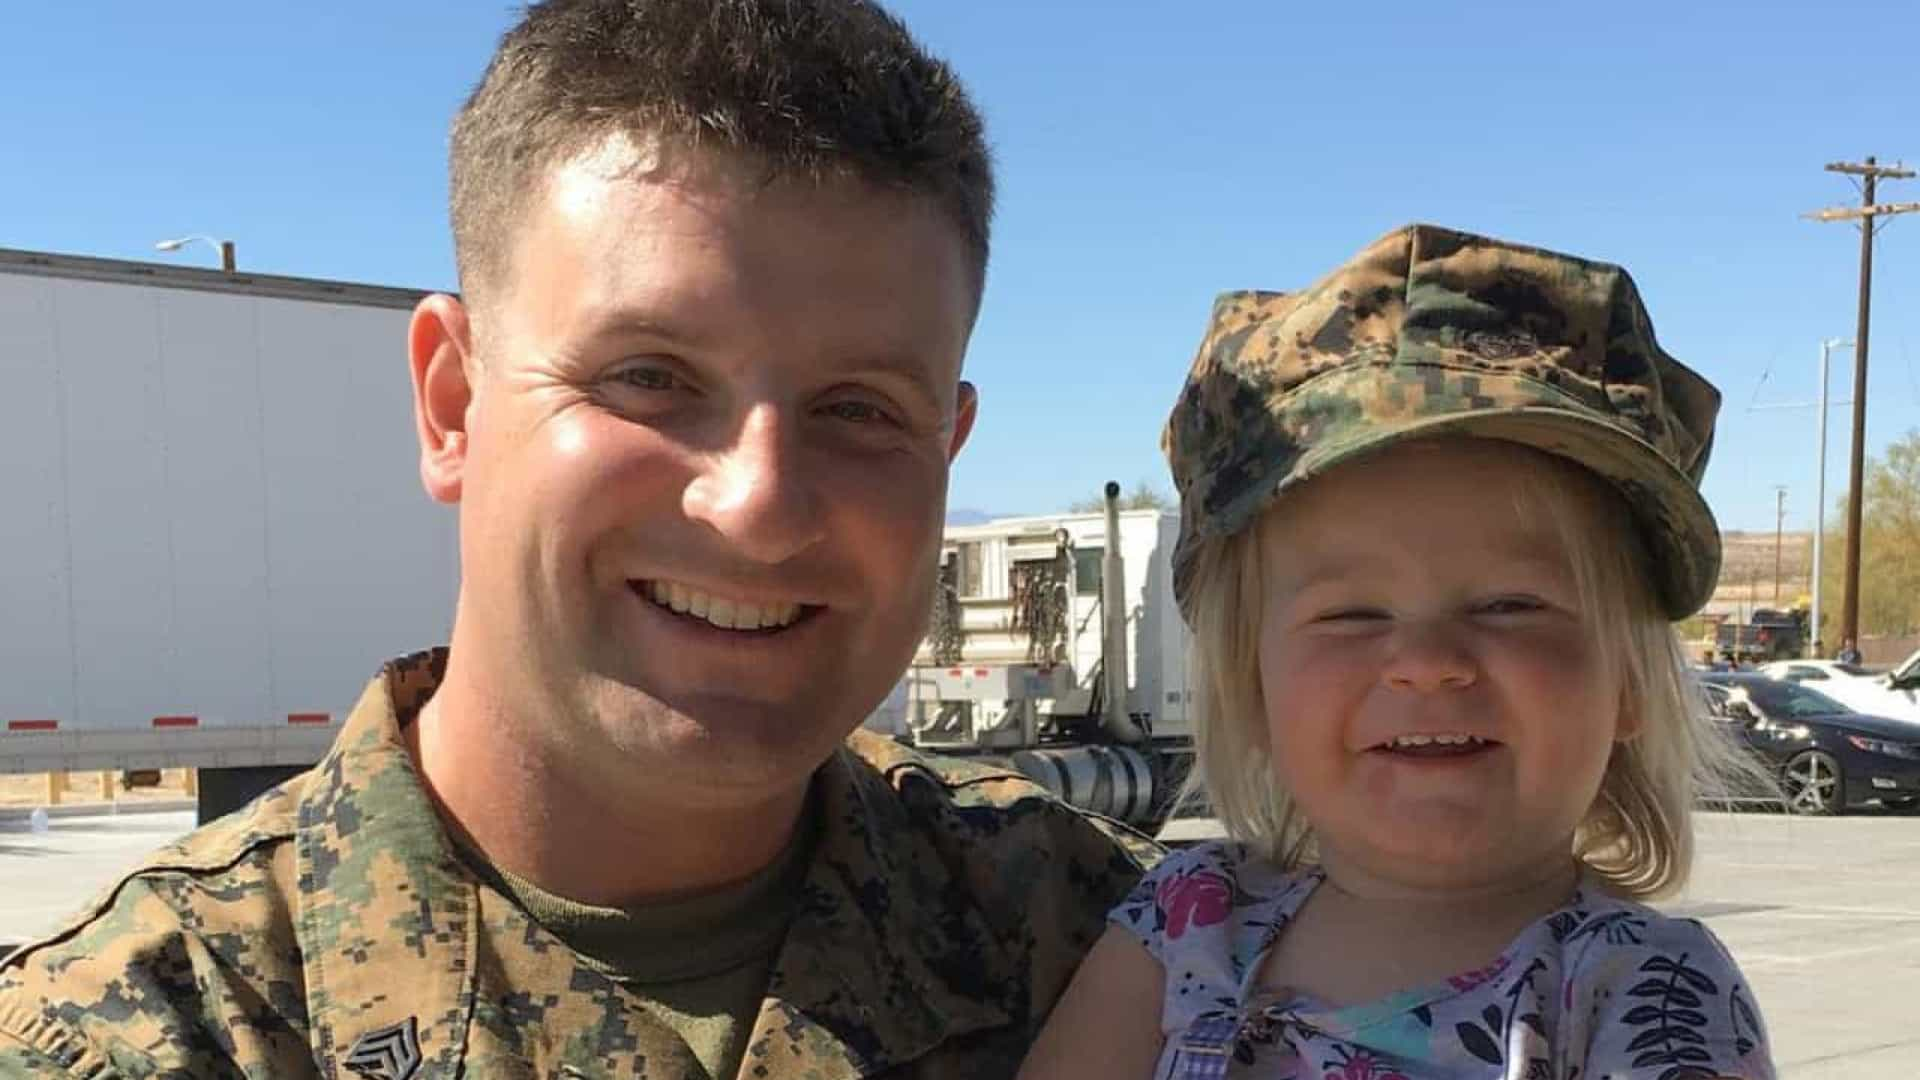 Emocionante: menina reencontra pai após 10 meses de serviço militar